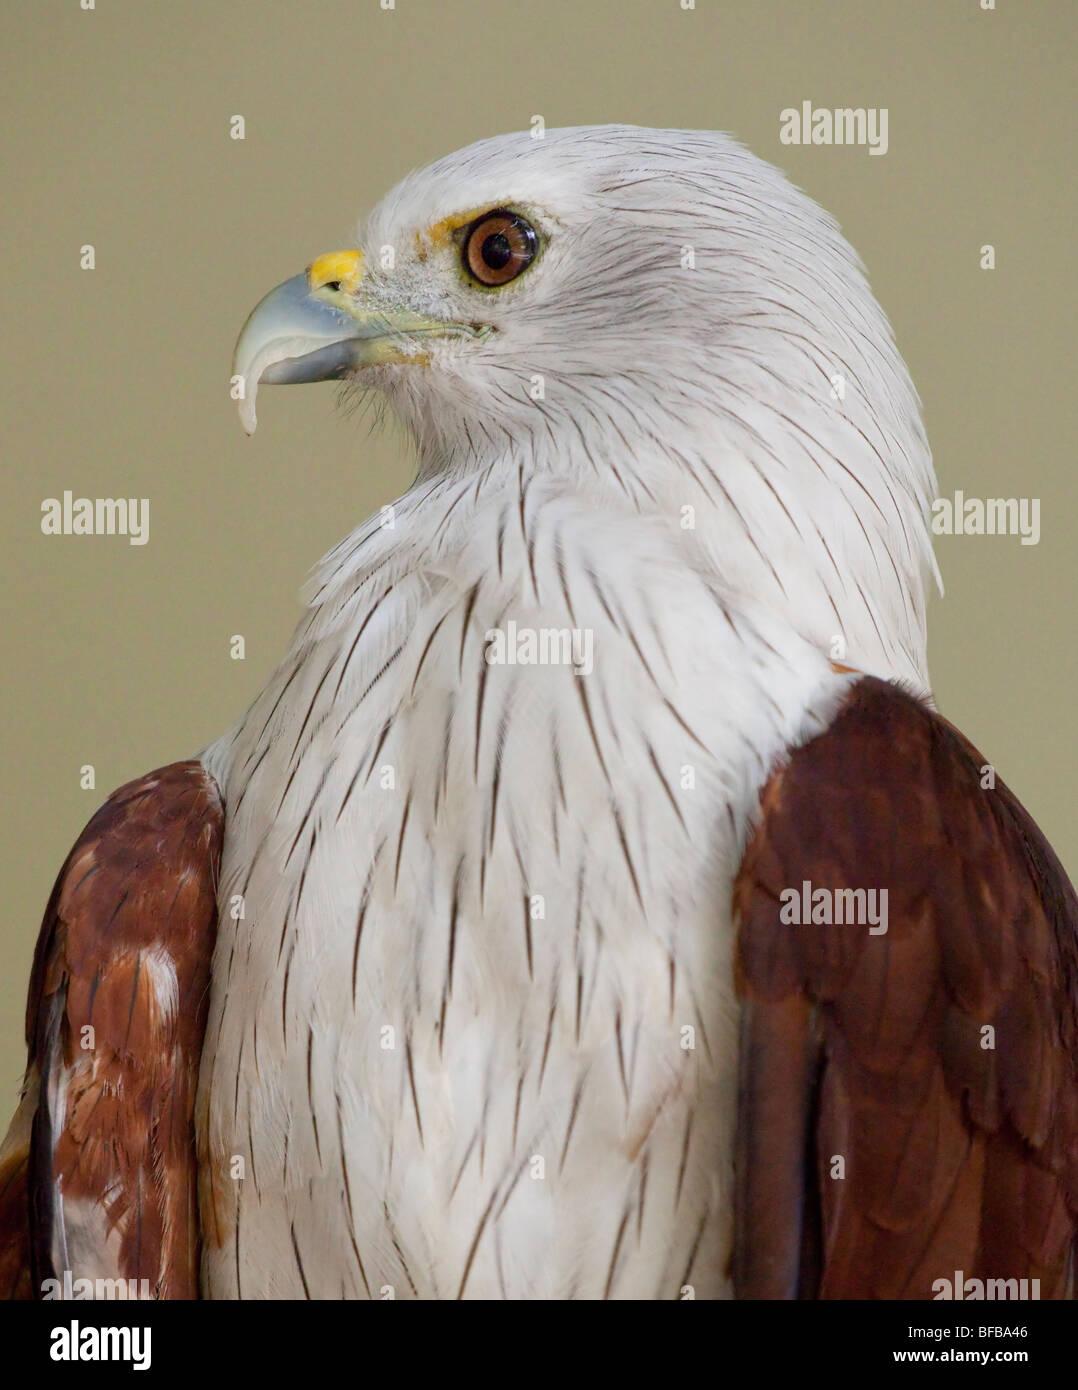 White-bellied Fish Eagle, Haliaeetus leucogaster, White-bellied Sea Eagle, Lang Laut/Siput (Malay) Stock Photo